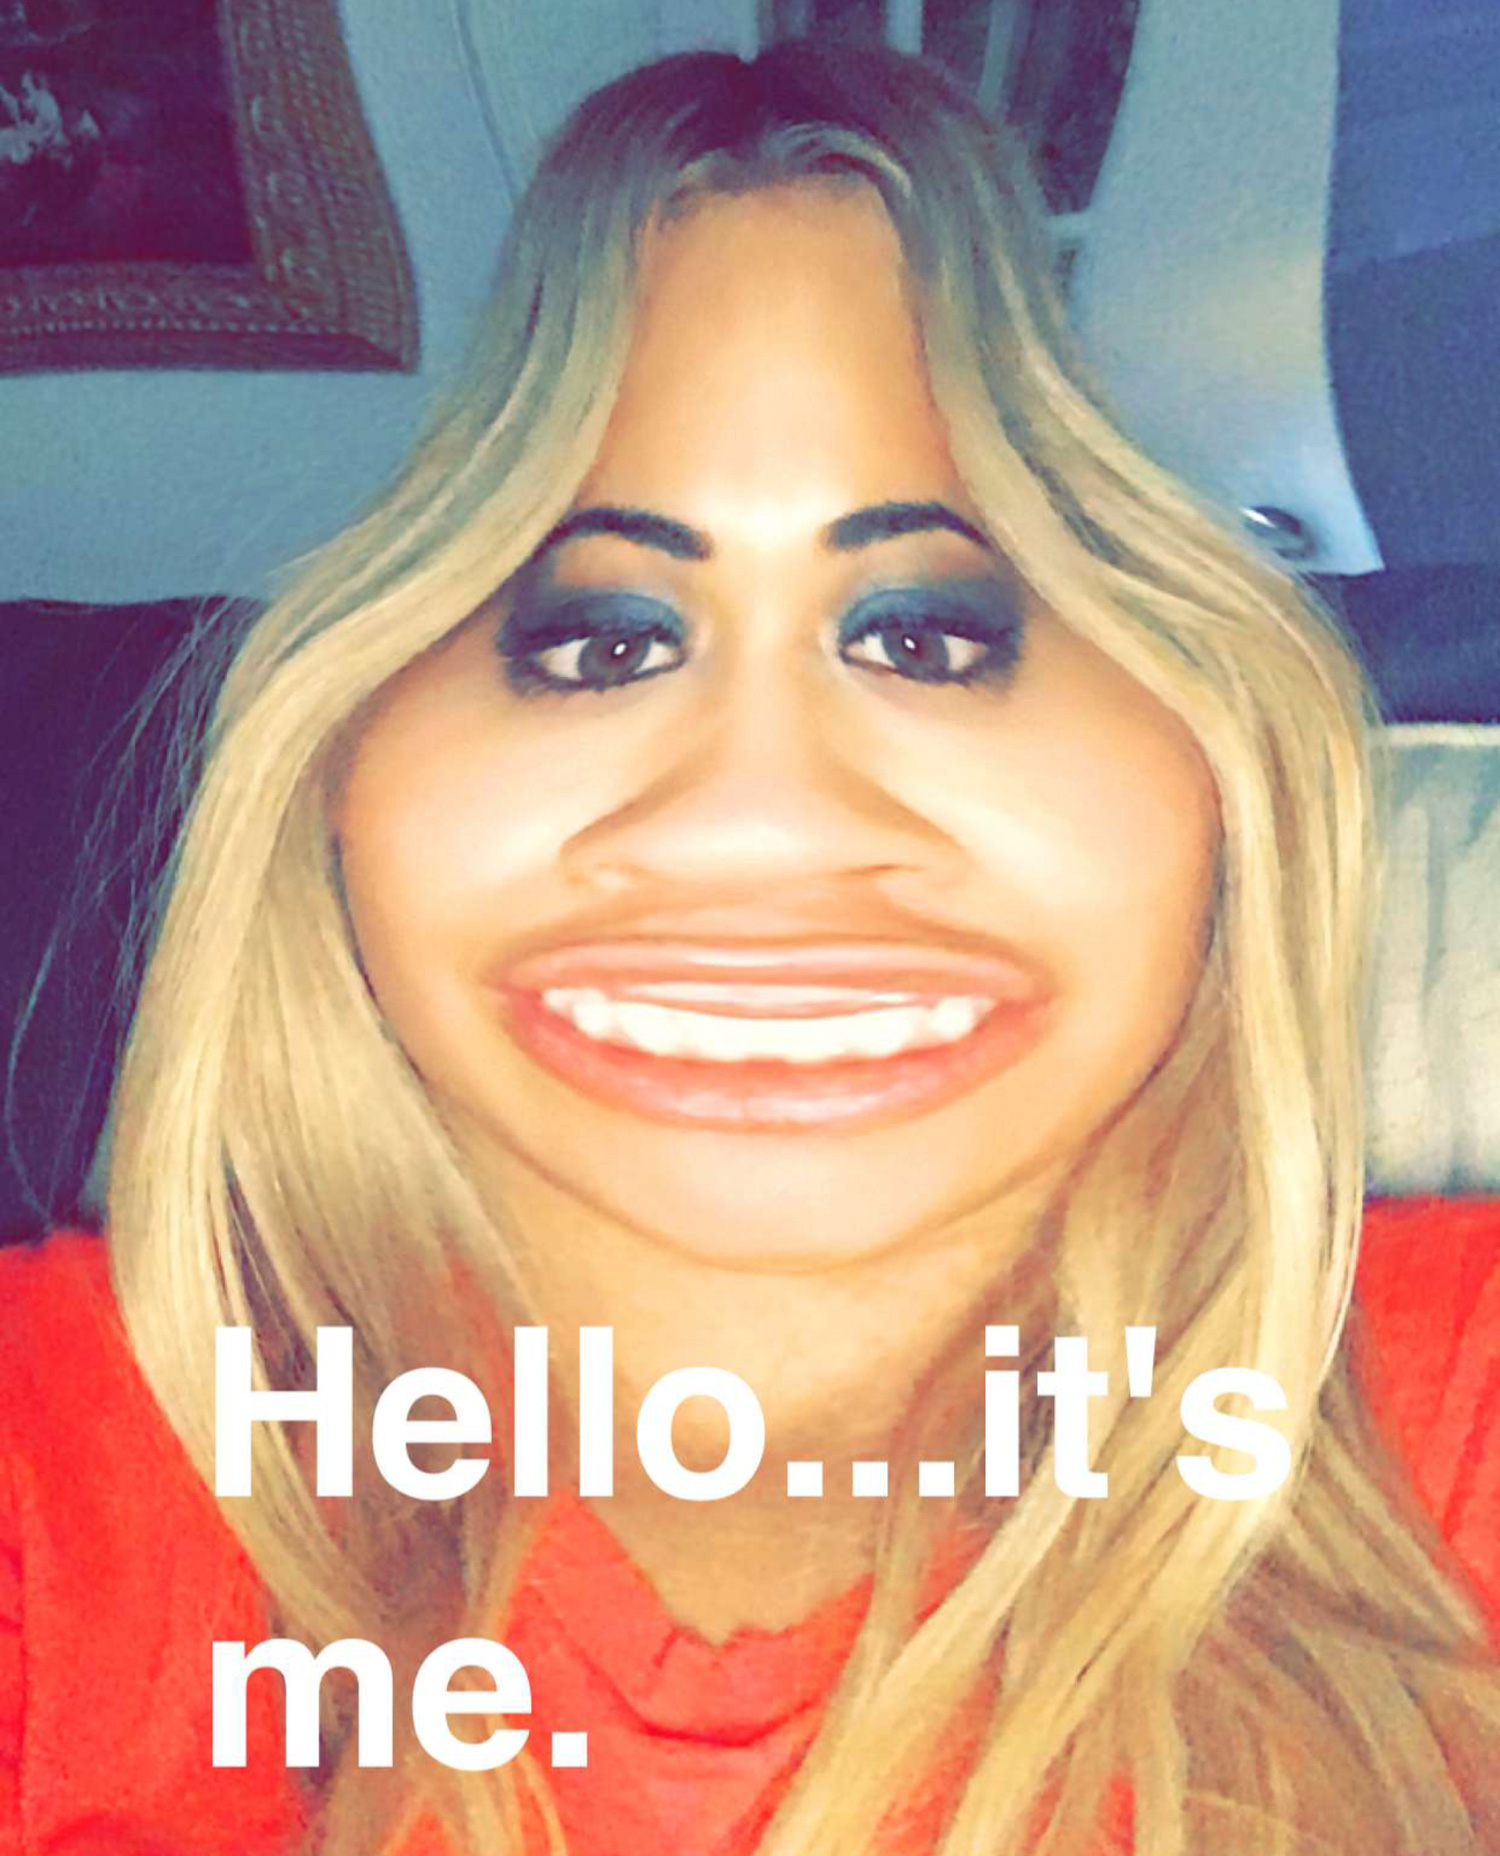 Rita Ora snapchat spoof